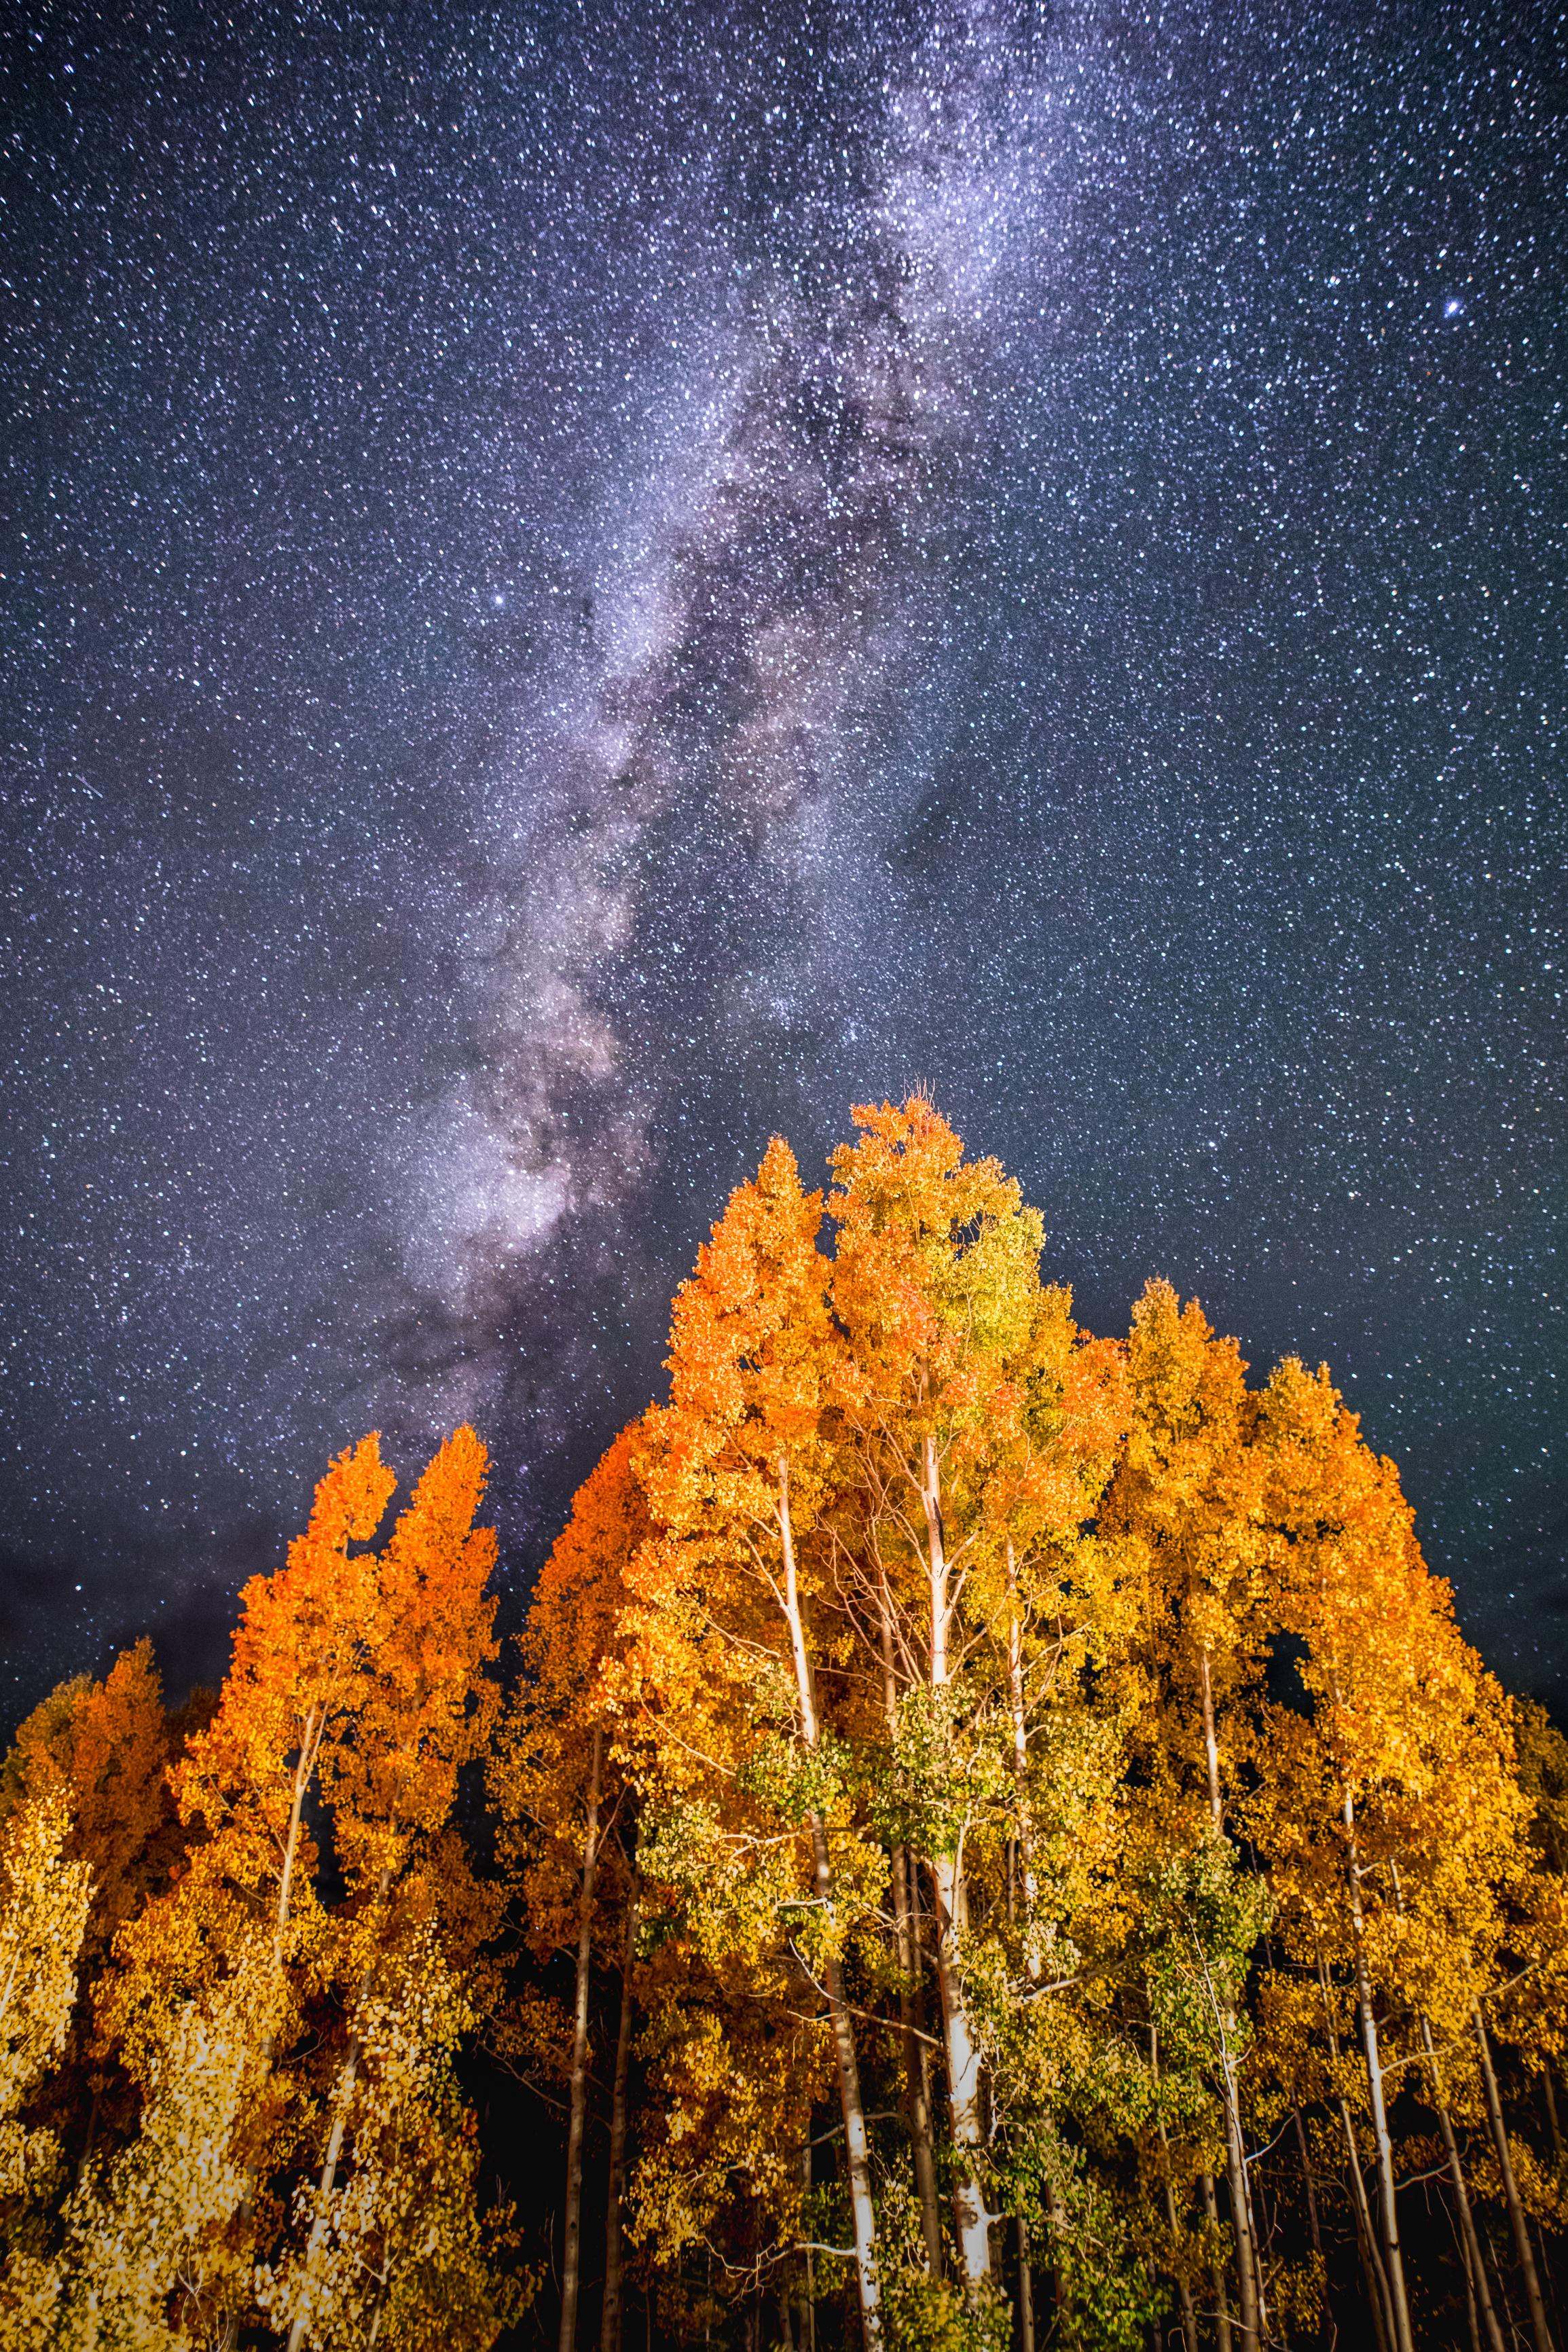 Coal Bank Pass Fall Colors and Milky Way, Image # 0608